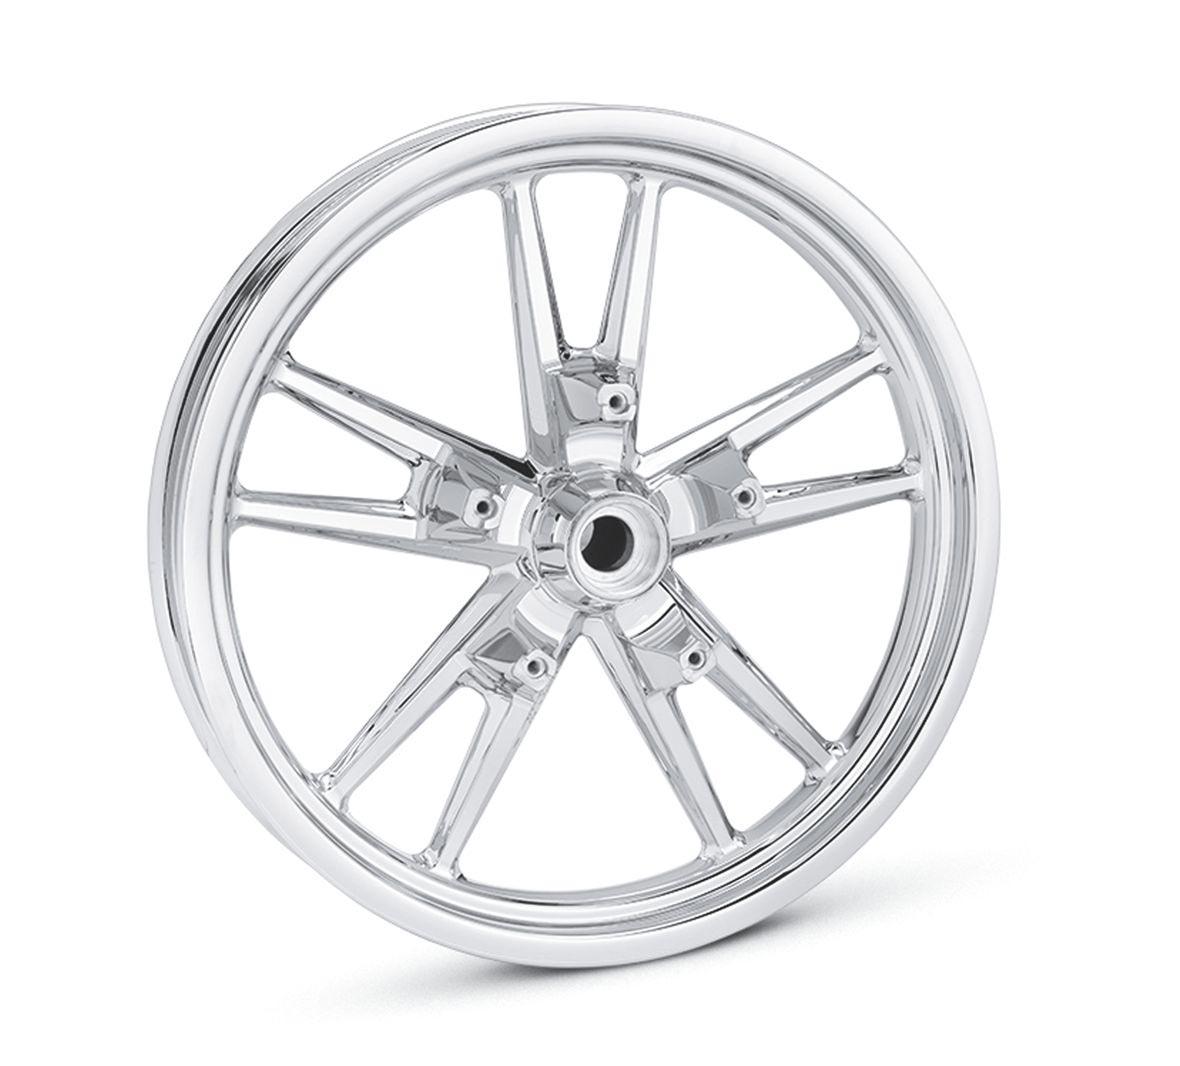 40359-10 Switchblade custom Wheel 19